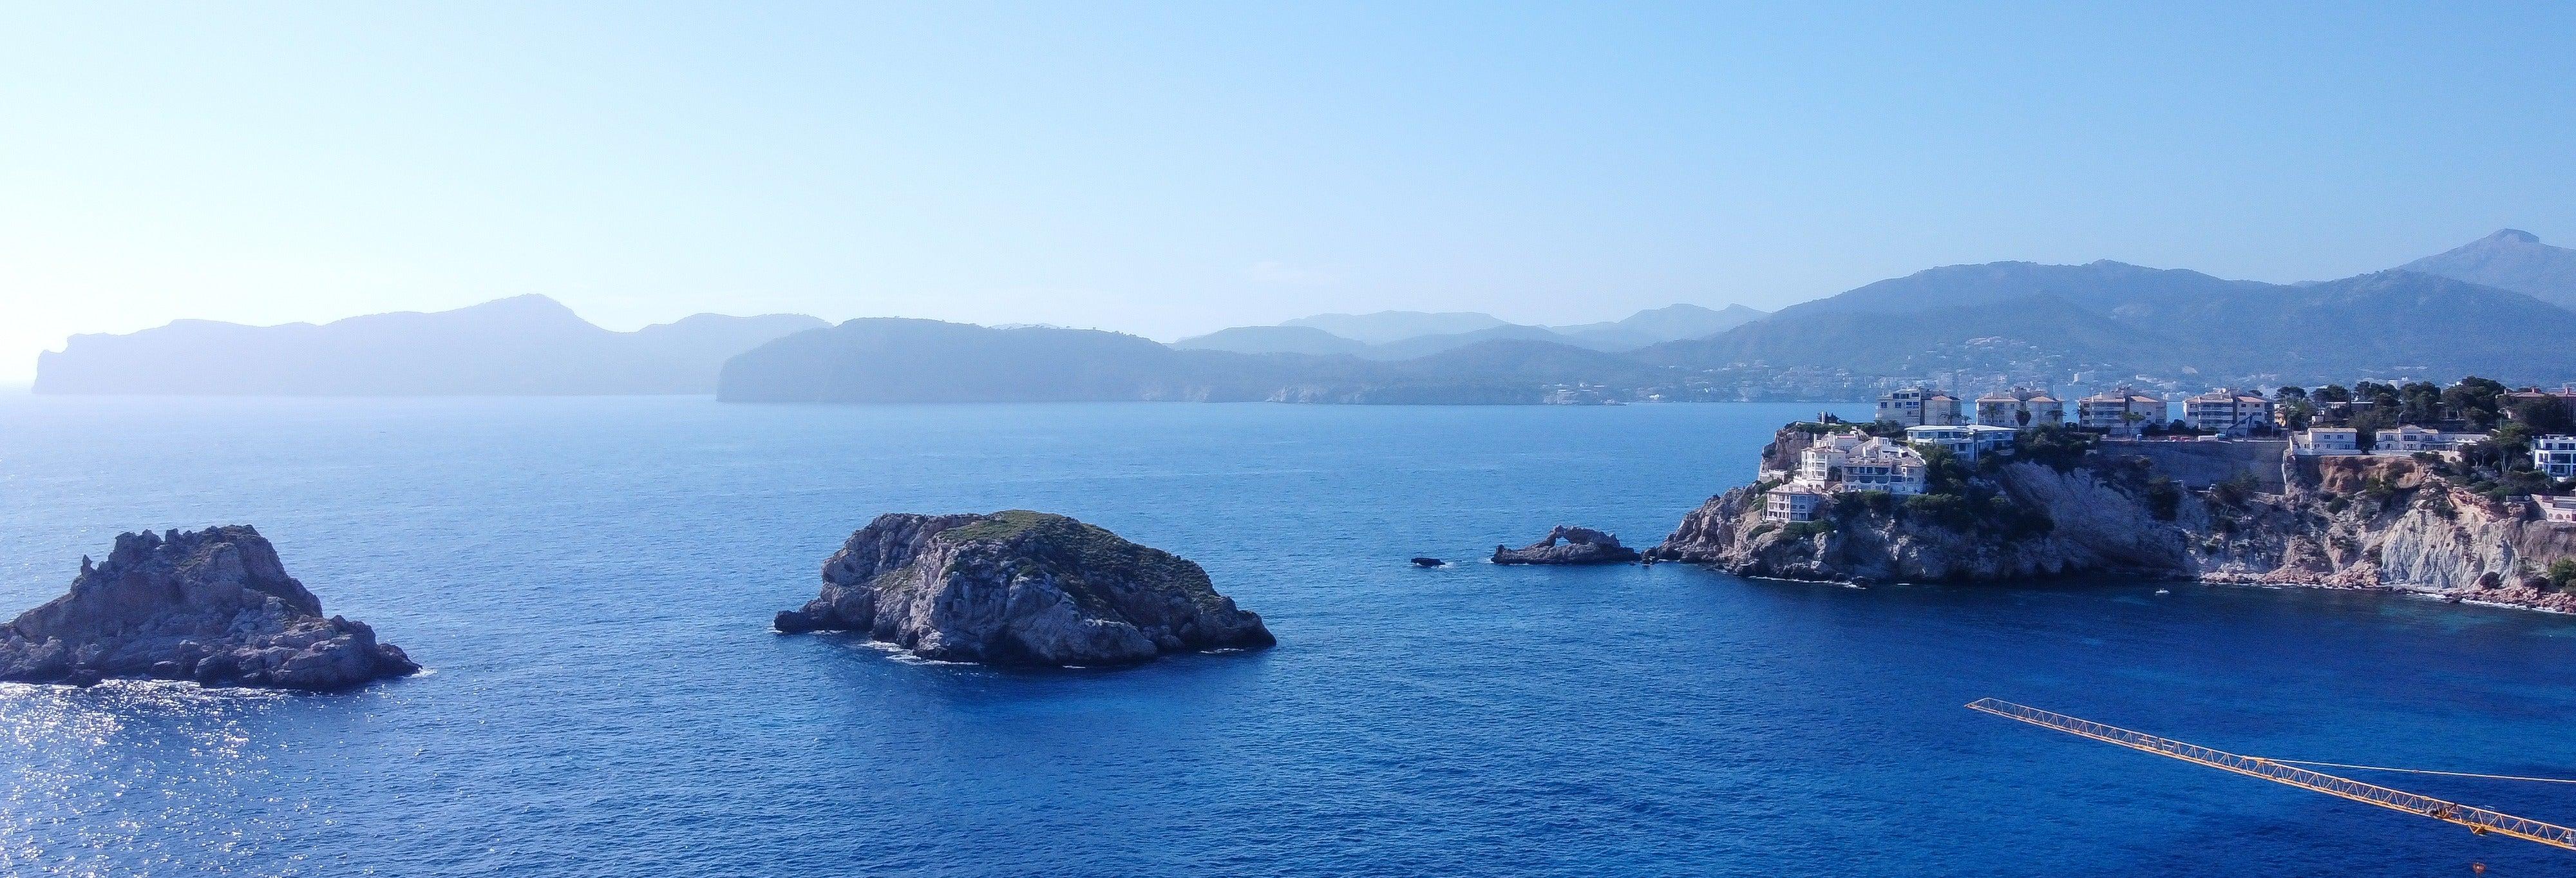 Passeio de barco com snorkel pelas Ilhas Malgrats saindo de Santa Ponsa